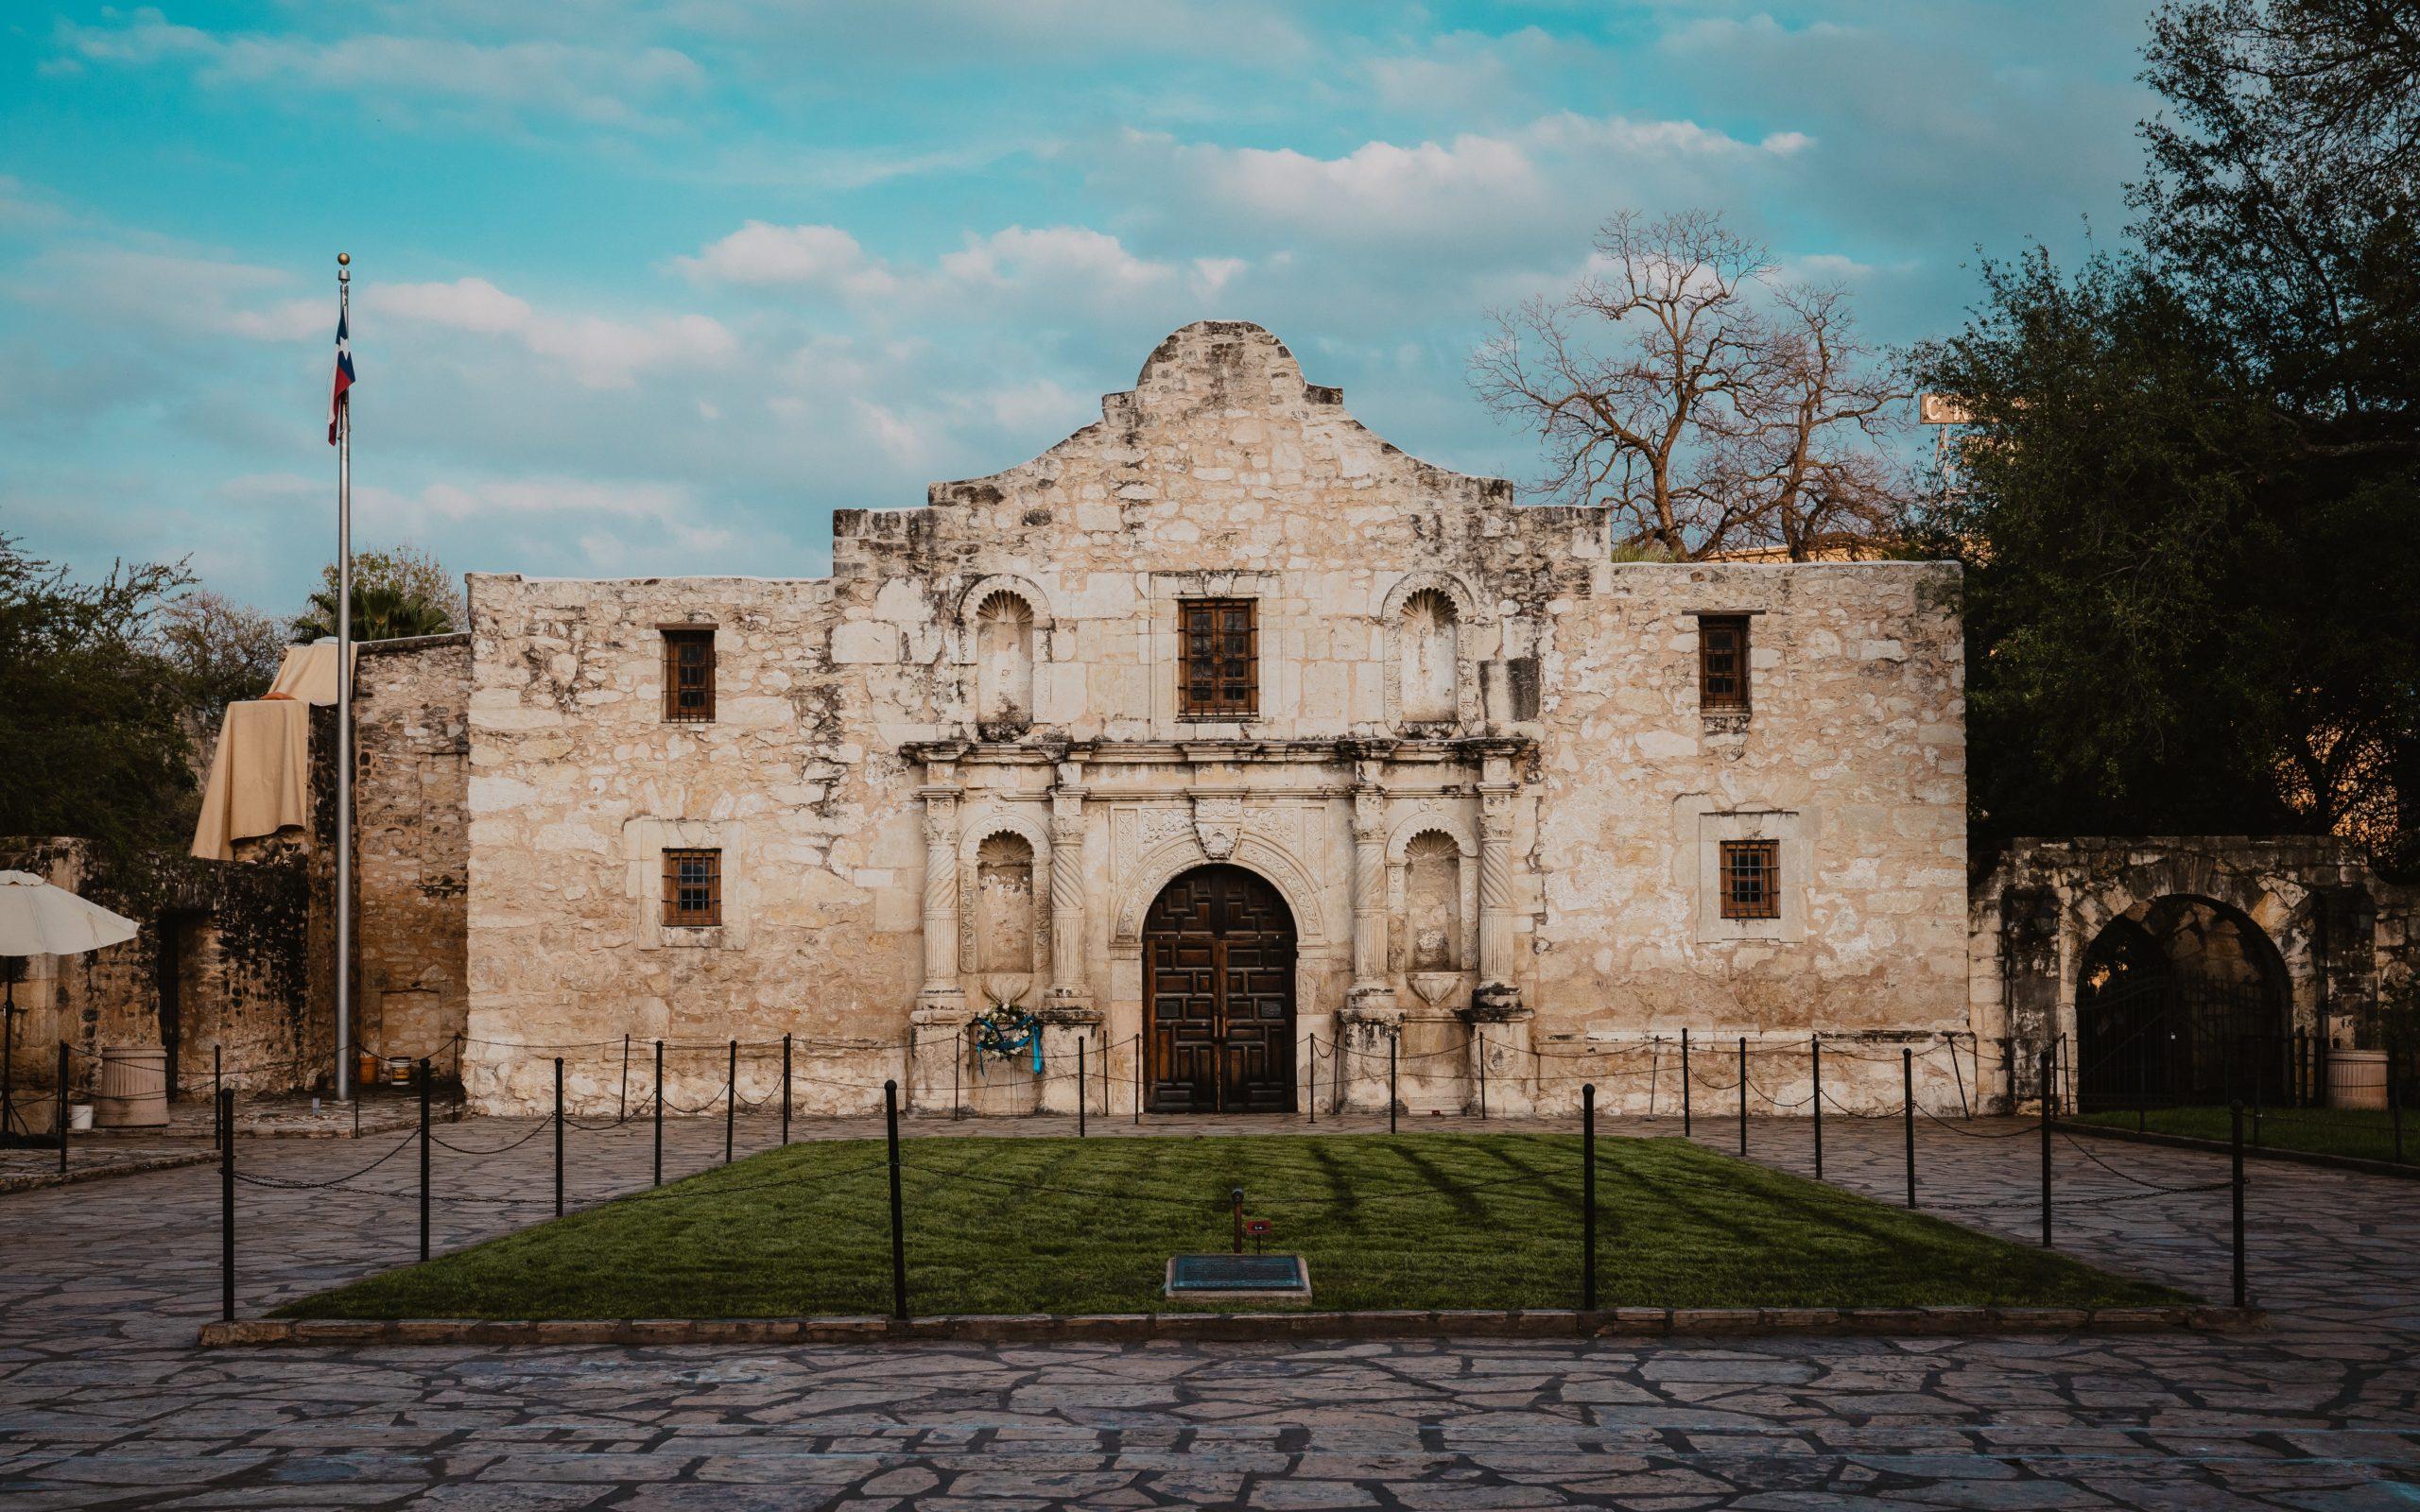 Historic Alamo building in downtown San Antonio, Texas